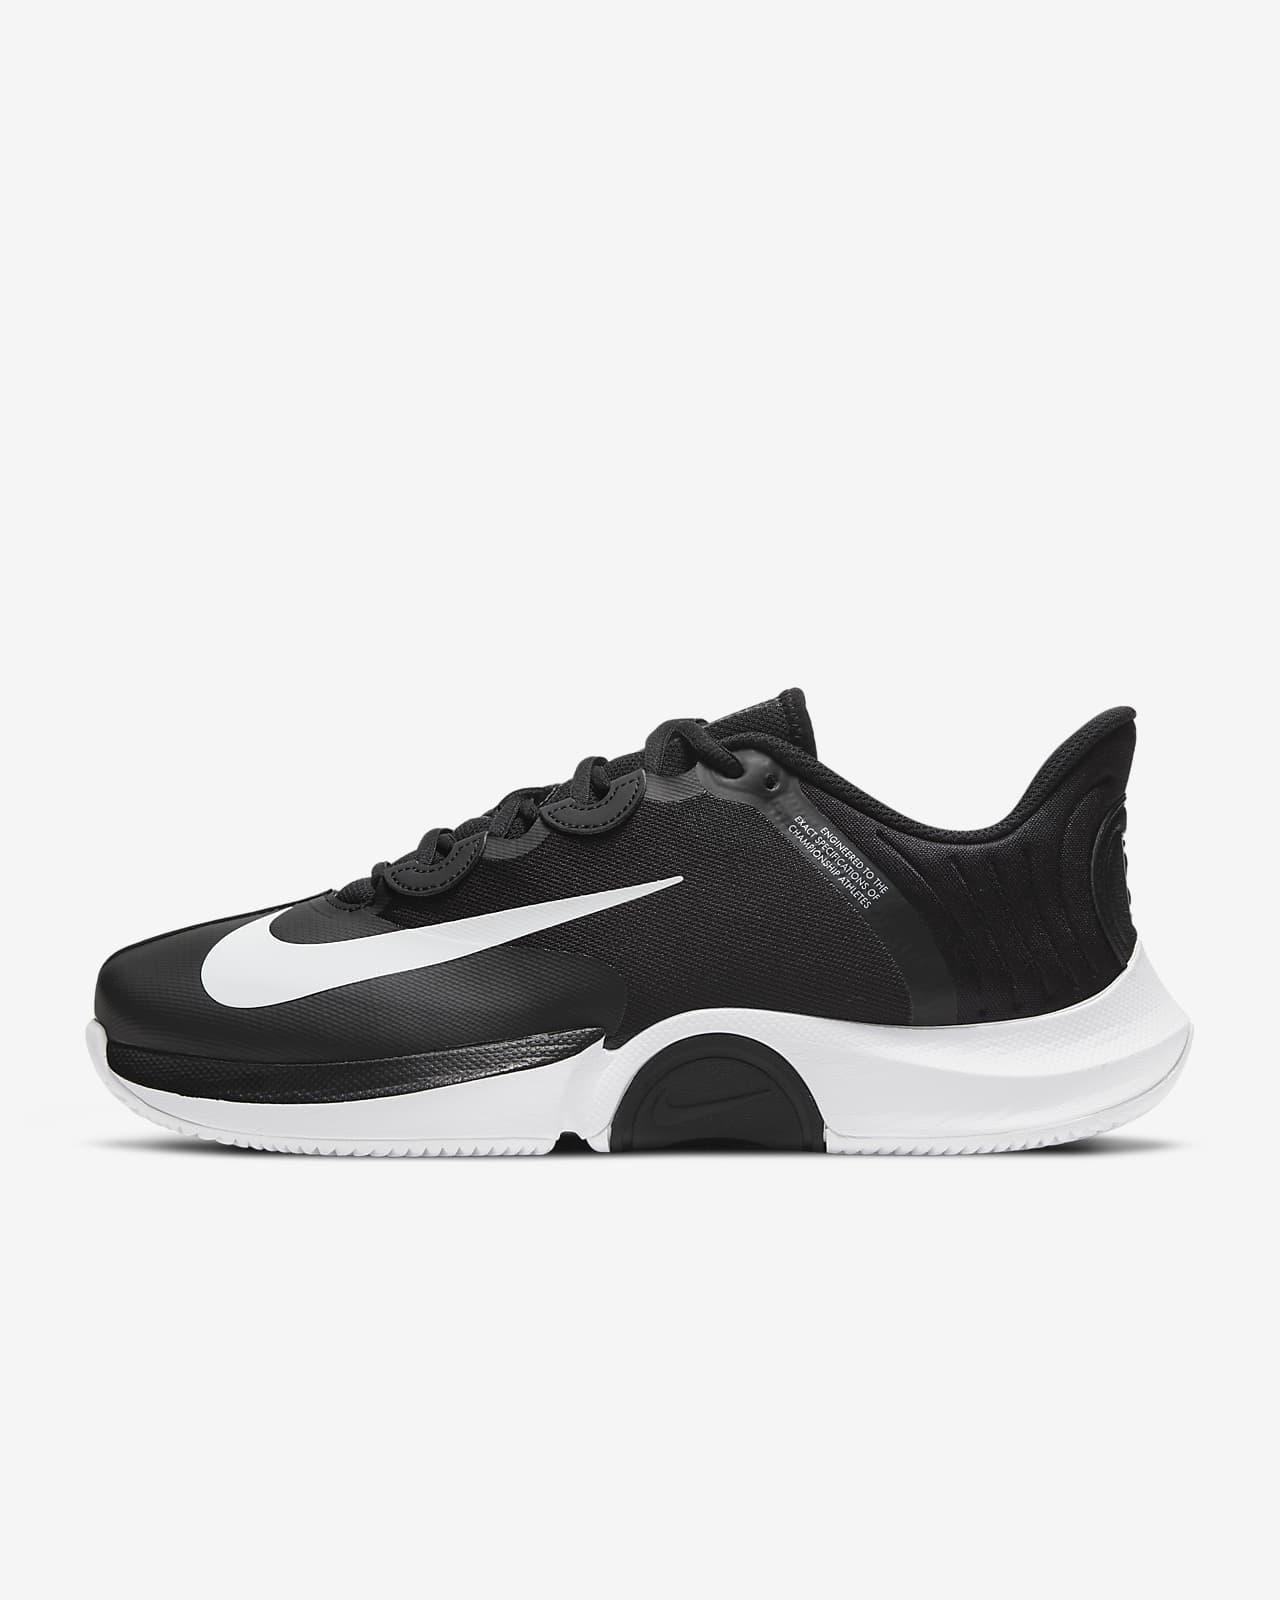 NikeCourt Air Zoom GP Turbo Men's Hard Court Tennis Shoes